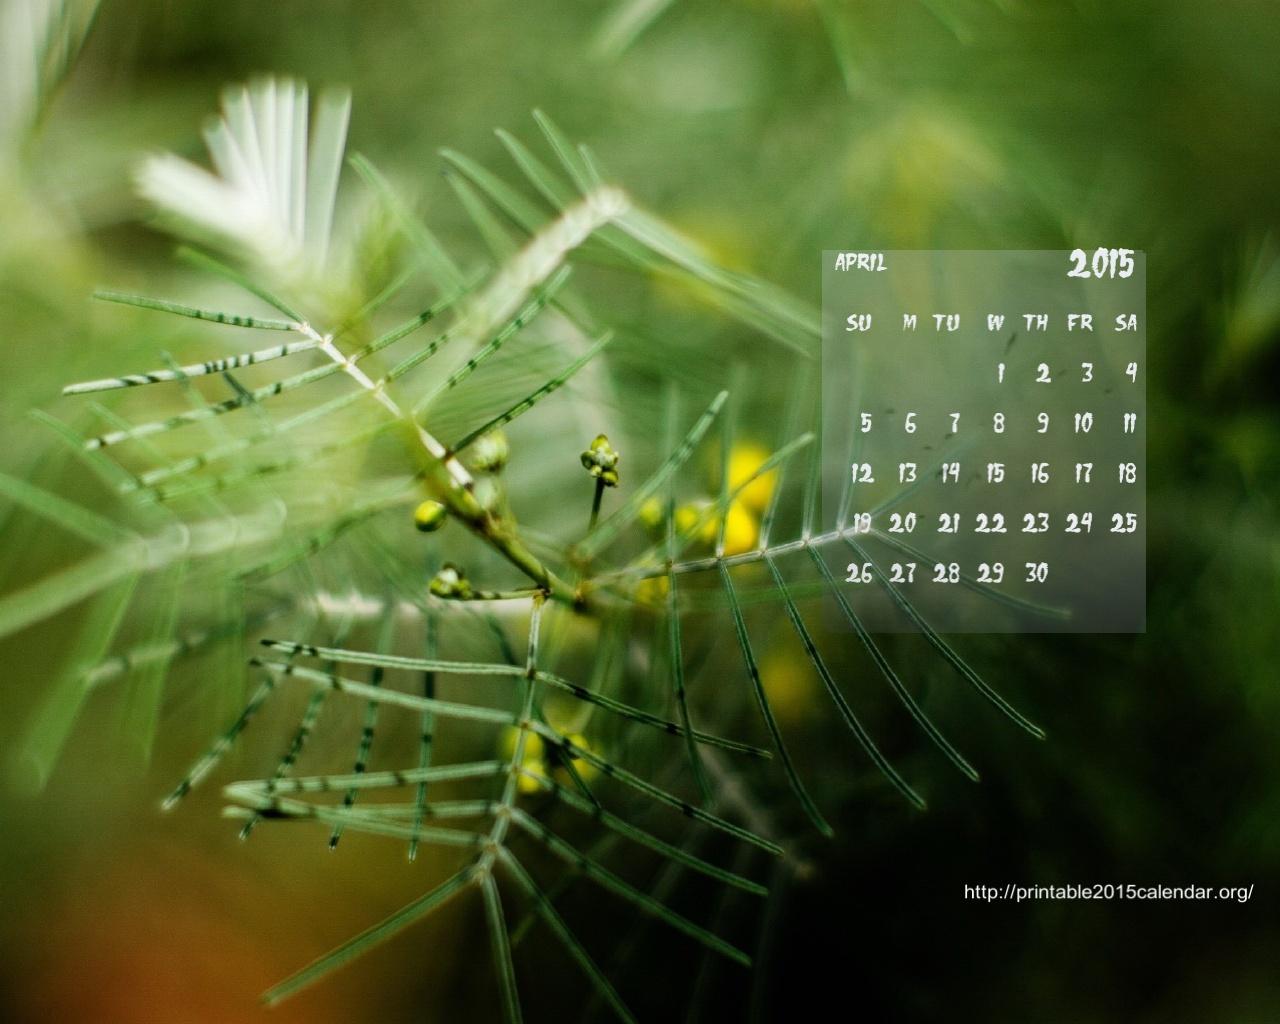 Live Calendar Wallpaper : March calendar wallpaper wallpapersafari